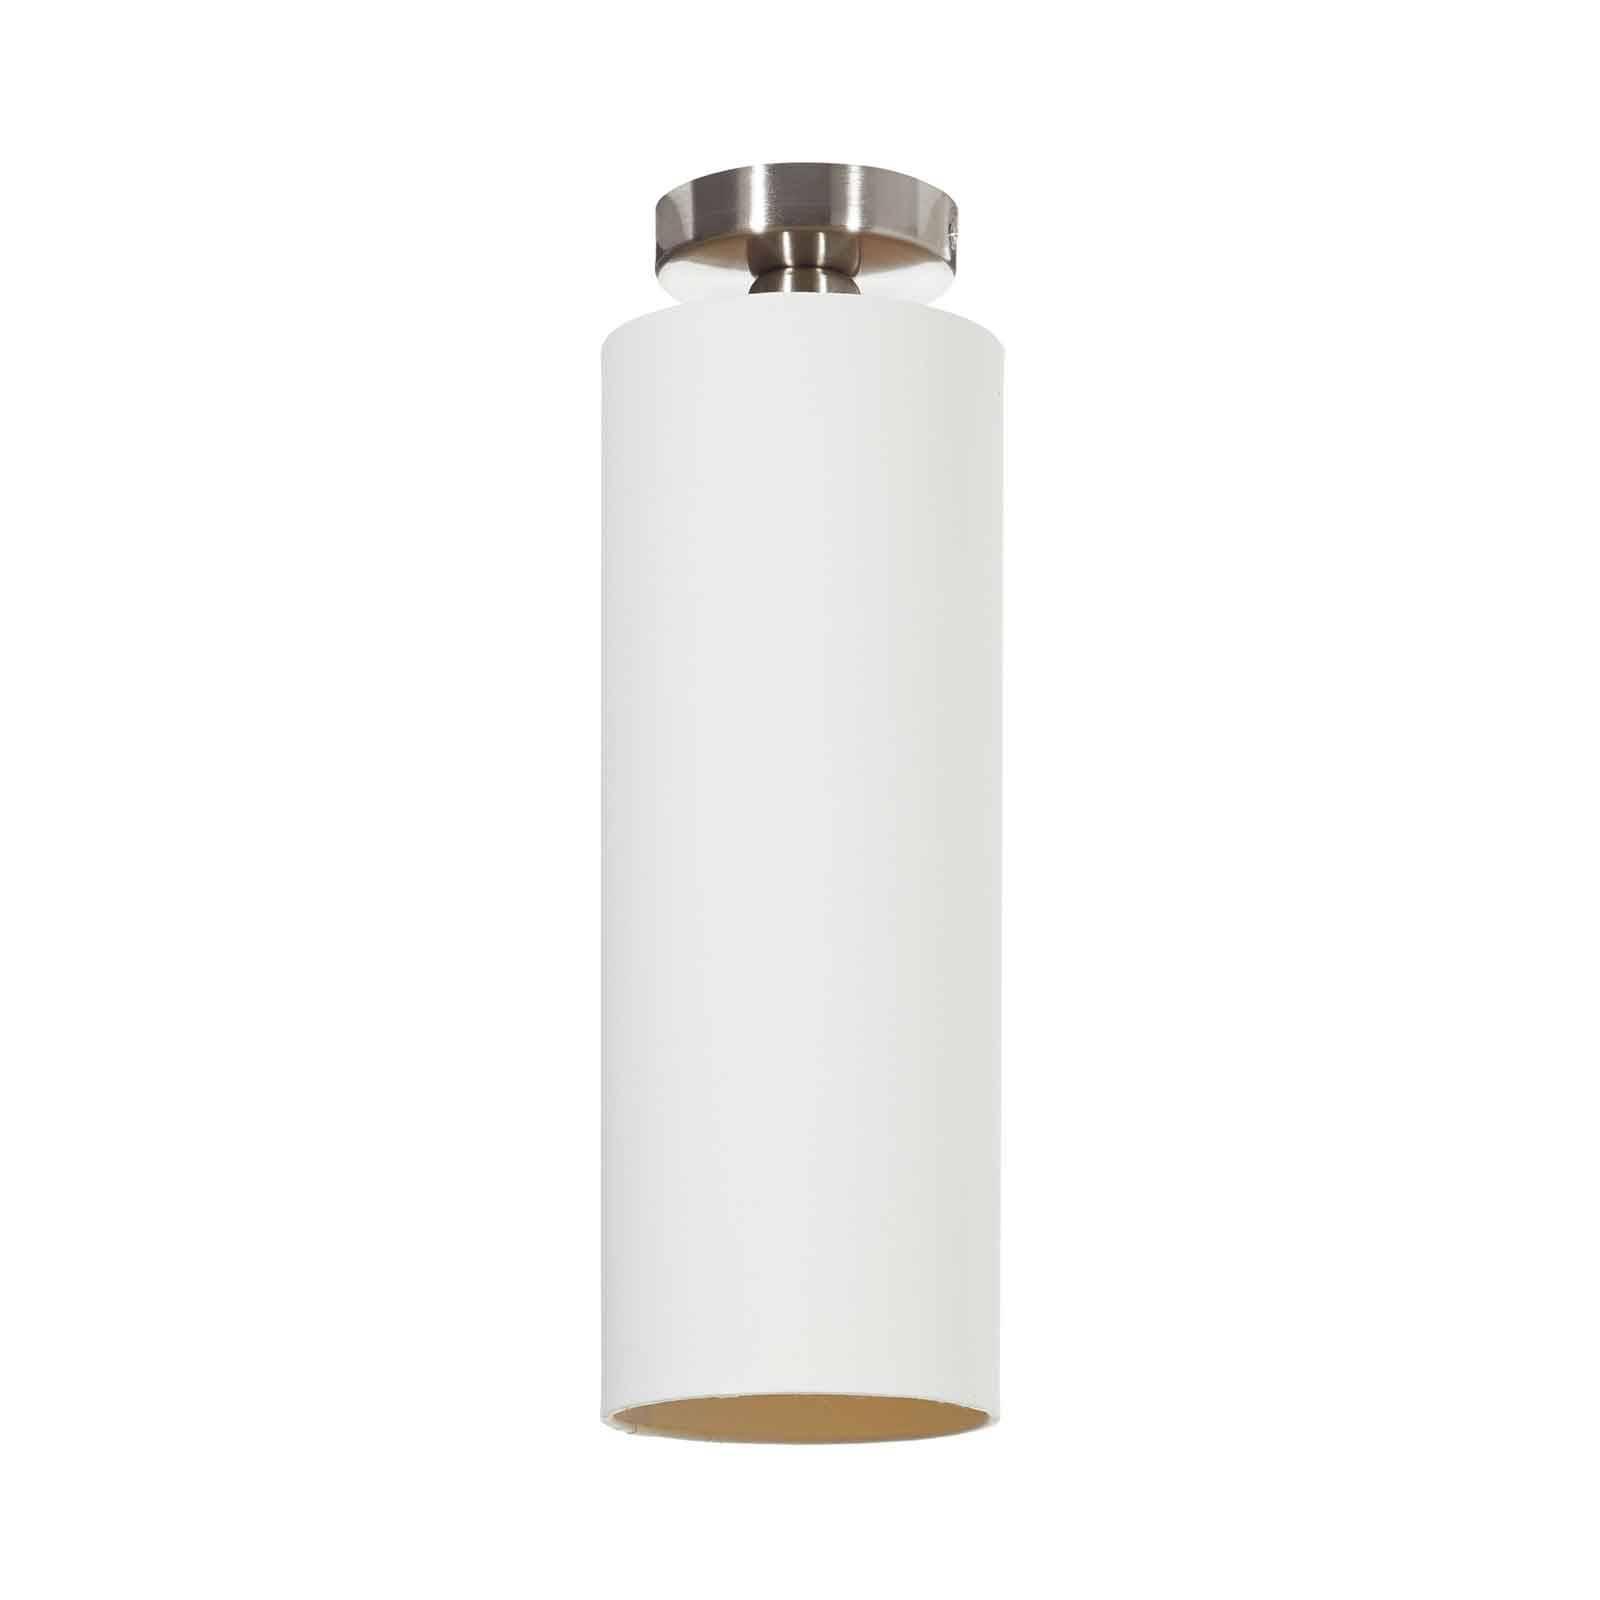 Lucande Patrik textiel-plafondlamp Ø15cm crème